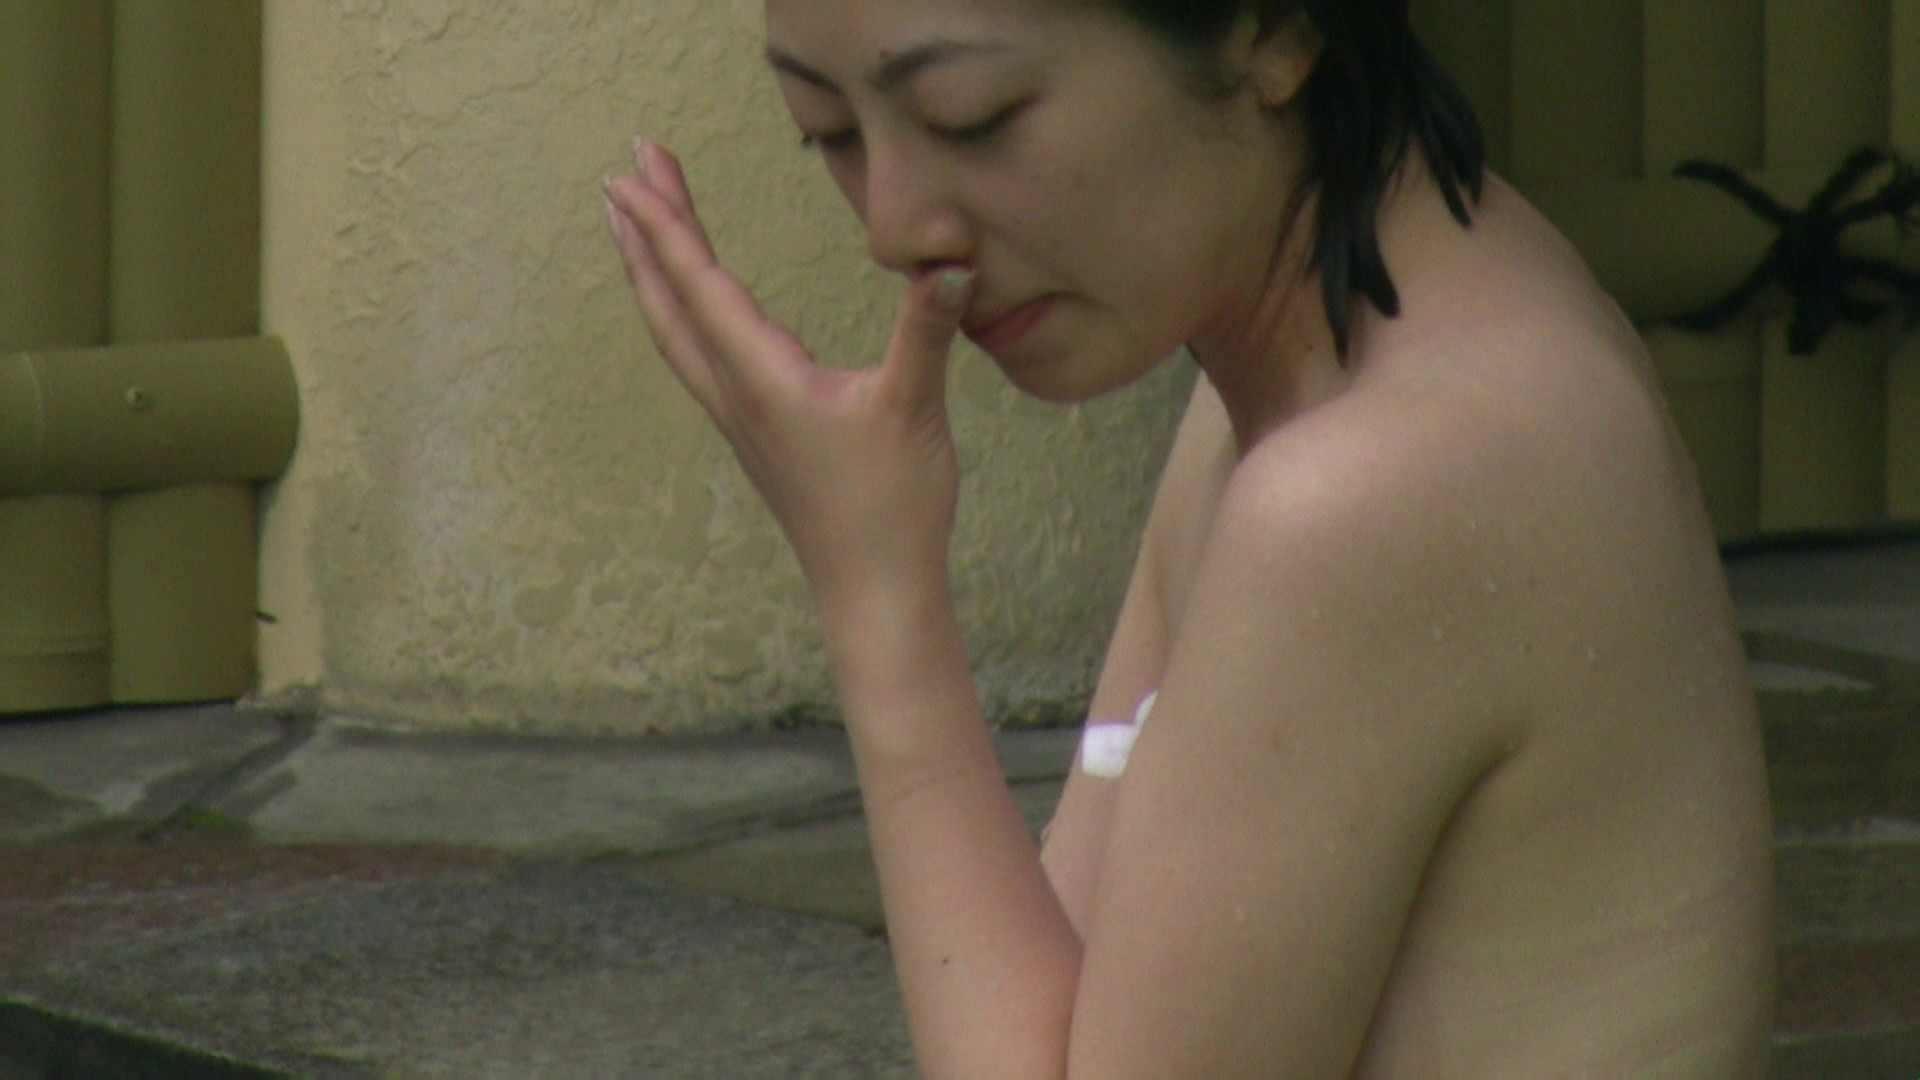 Aquaな露天風呂Vol.04 露天風呂編 | 盗撮シリーズ  94PIX 29